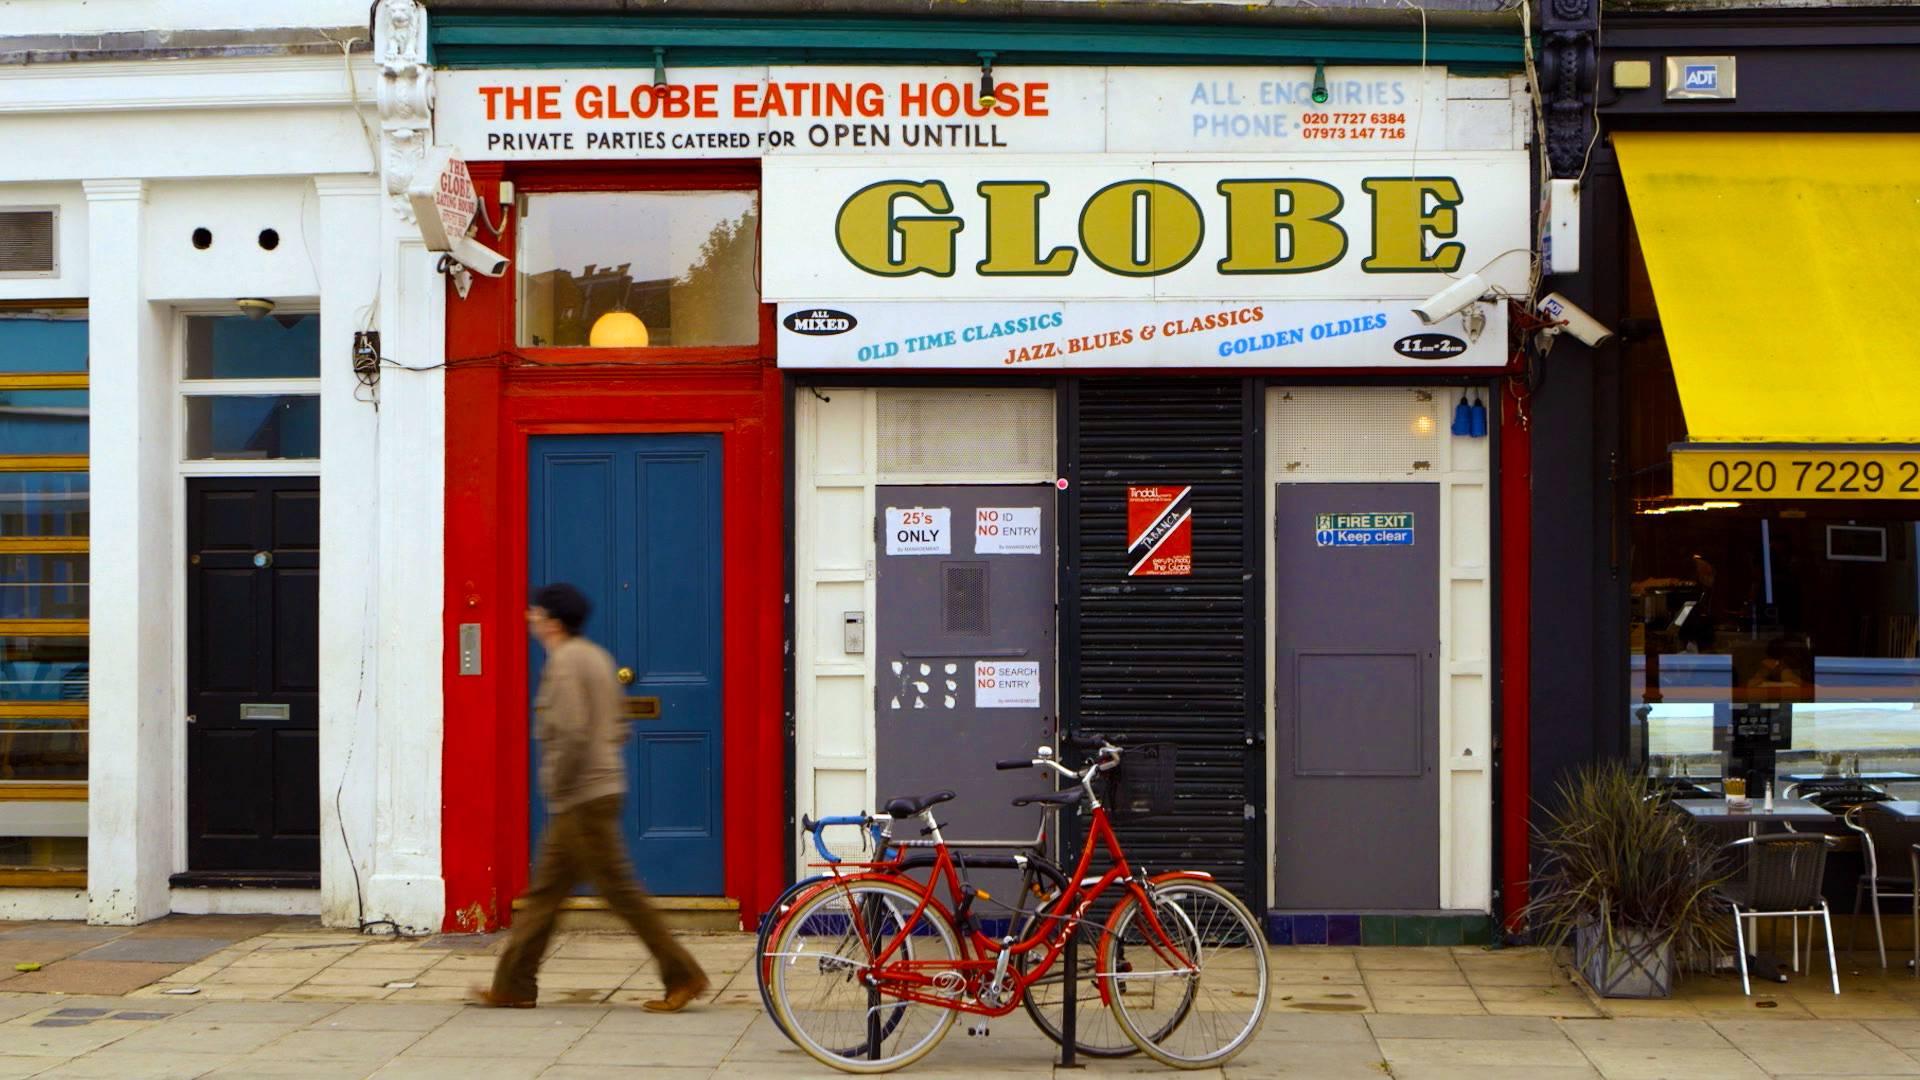 geoff-globe-wide-1920x1080.jpg